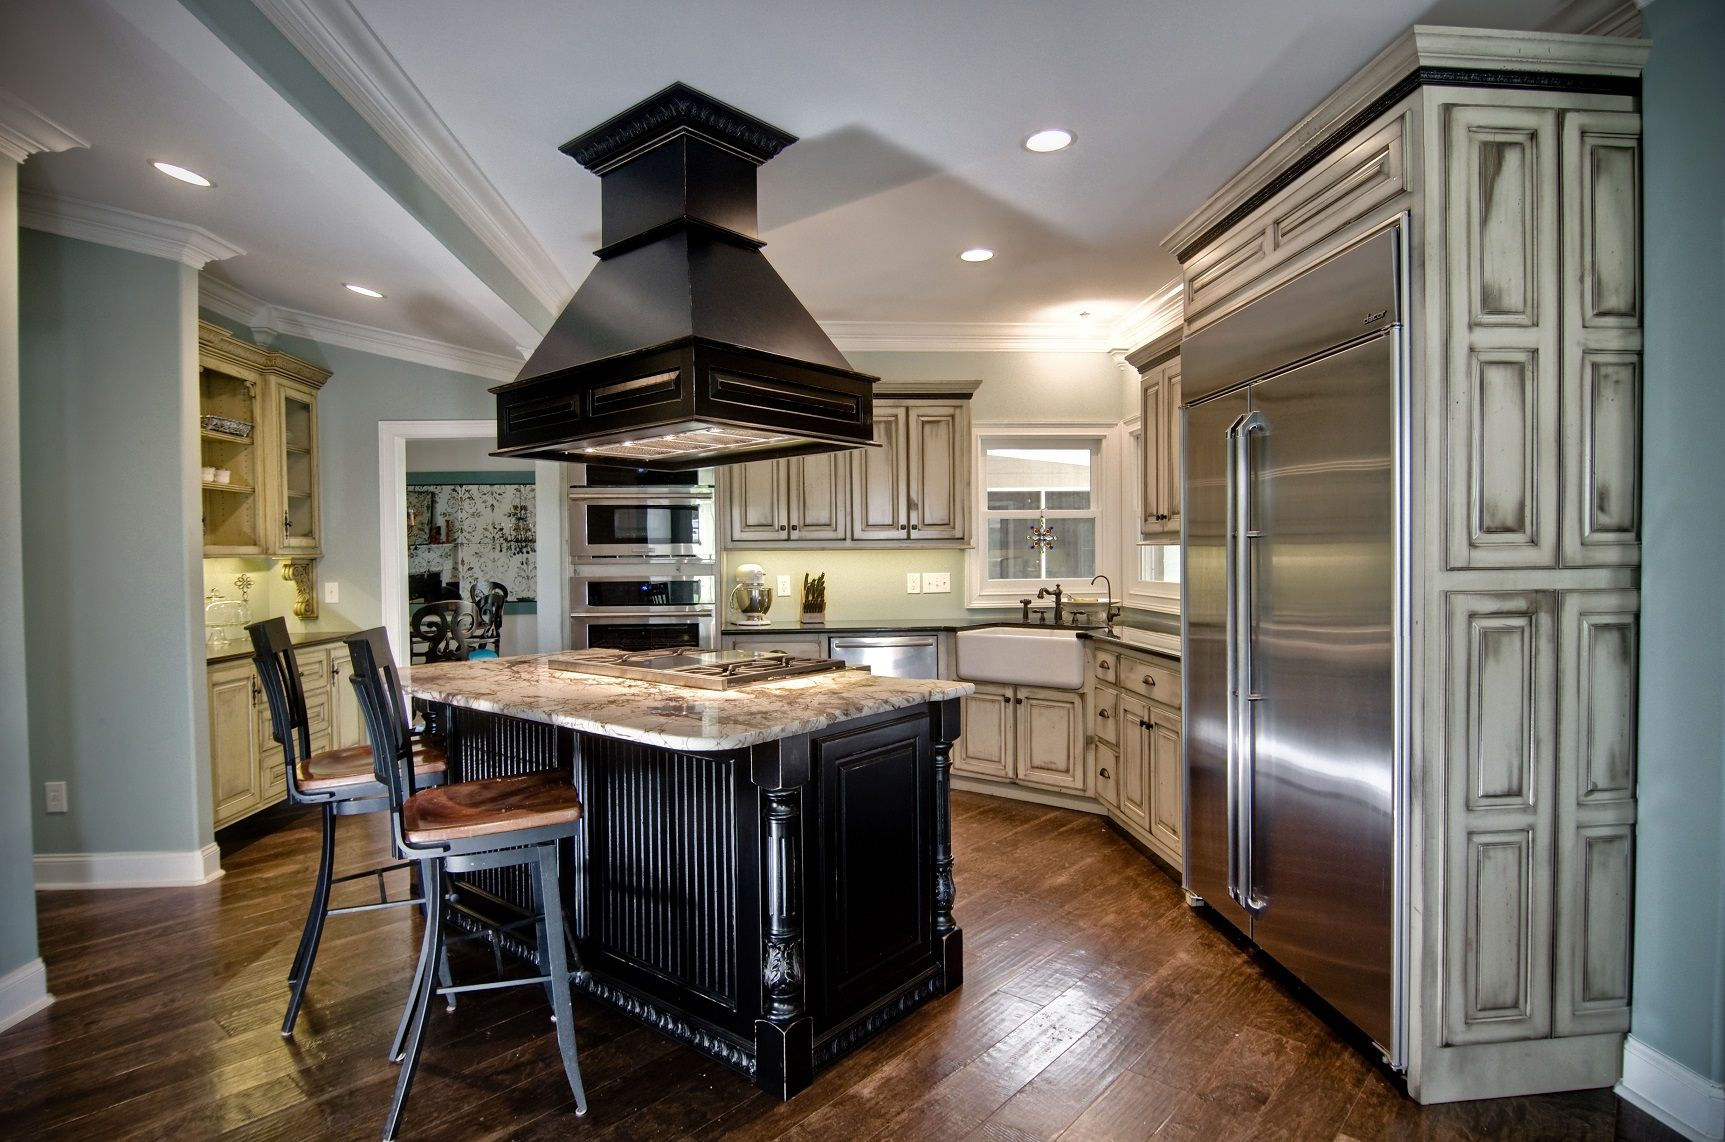 Modern Island Range Hoods For Kitchen Design Looks Fabulos: Endearing Kitchen…